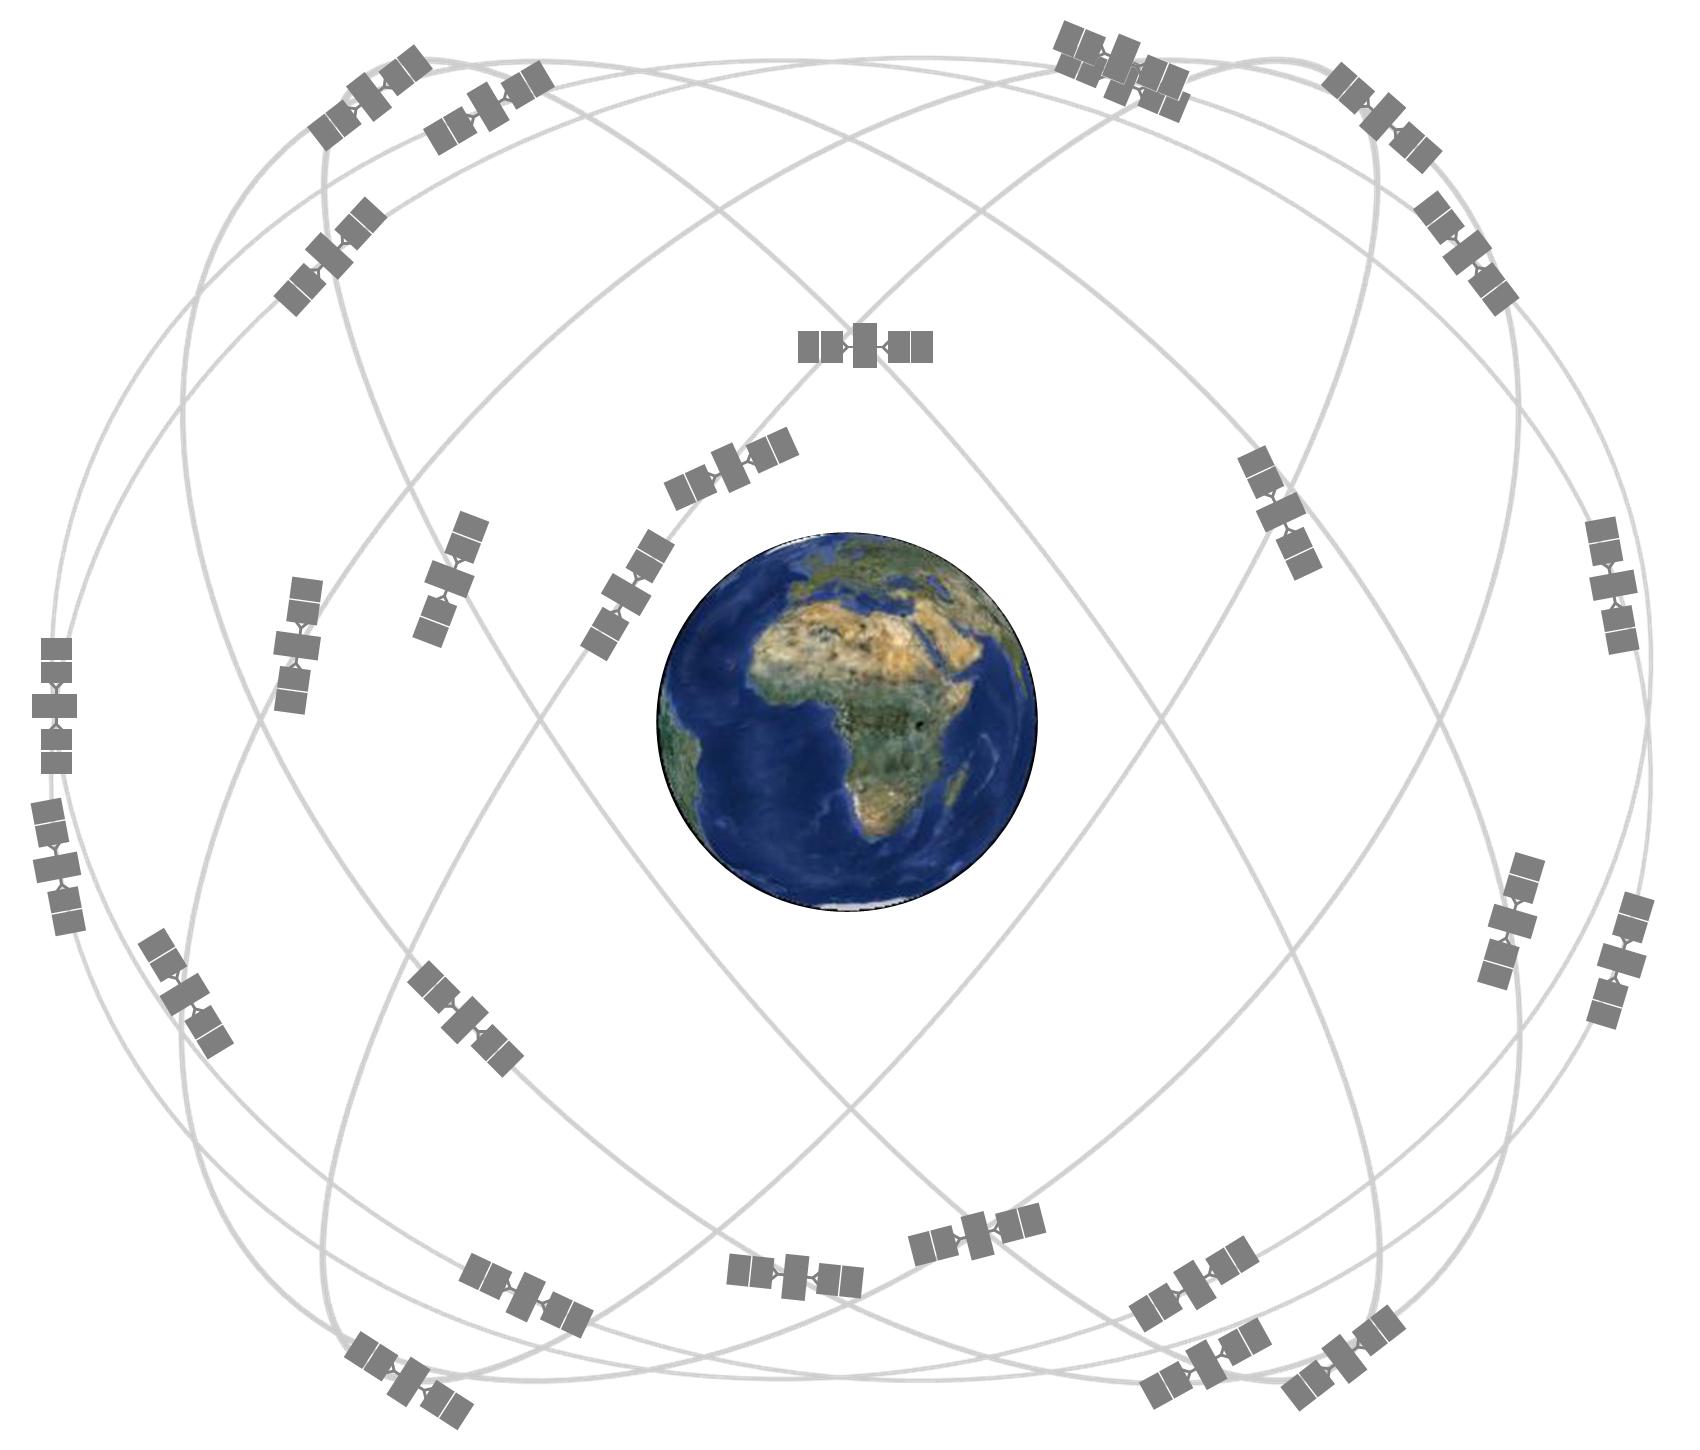 Illustration of GPS satellites orbiting around Earth